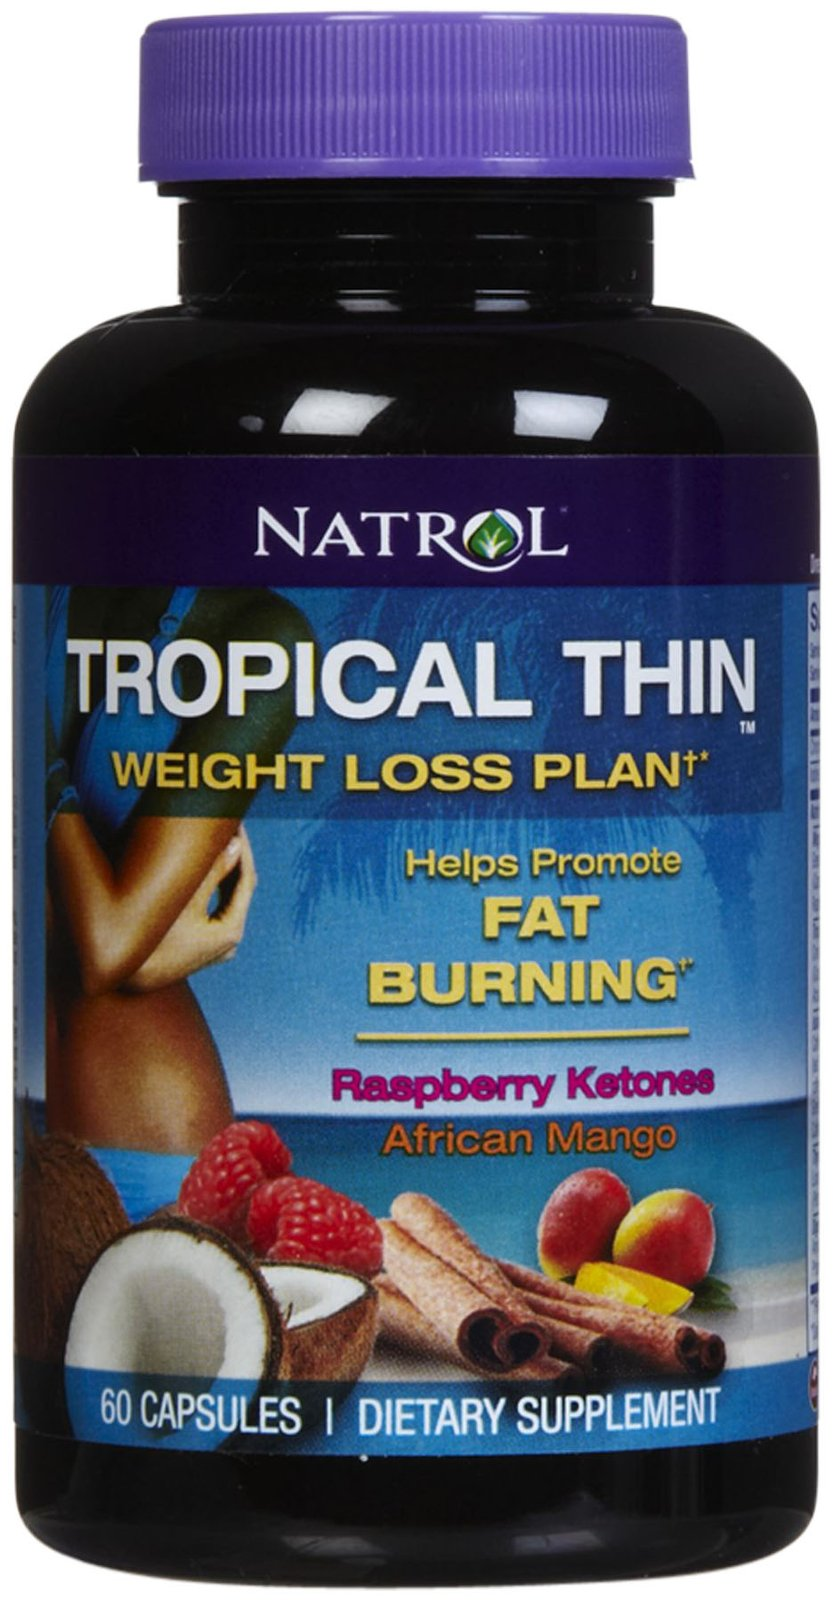 Natrol Tropical Thin